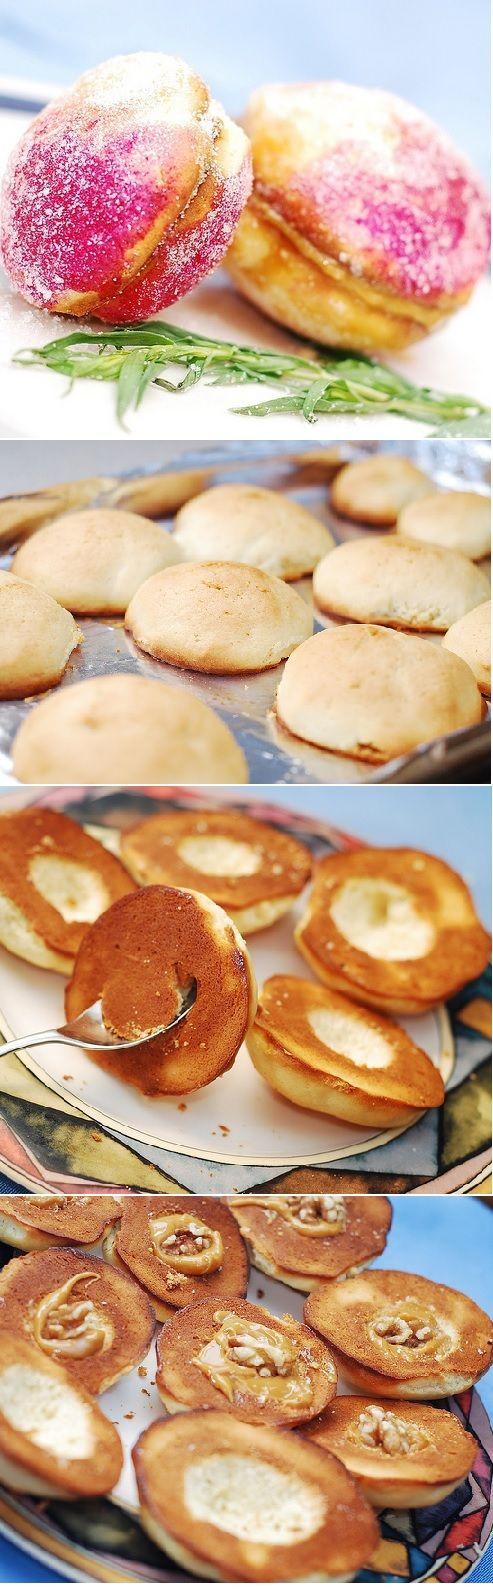 """Pechenie persiki"" - peach shaped sandwich cookies with dulce de leche and walnut filling."